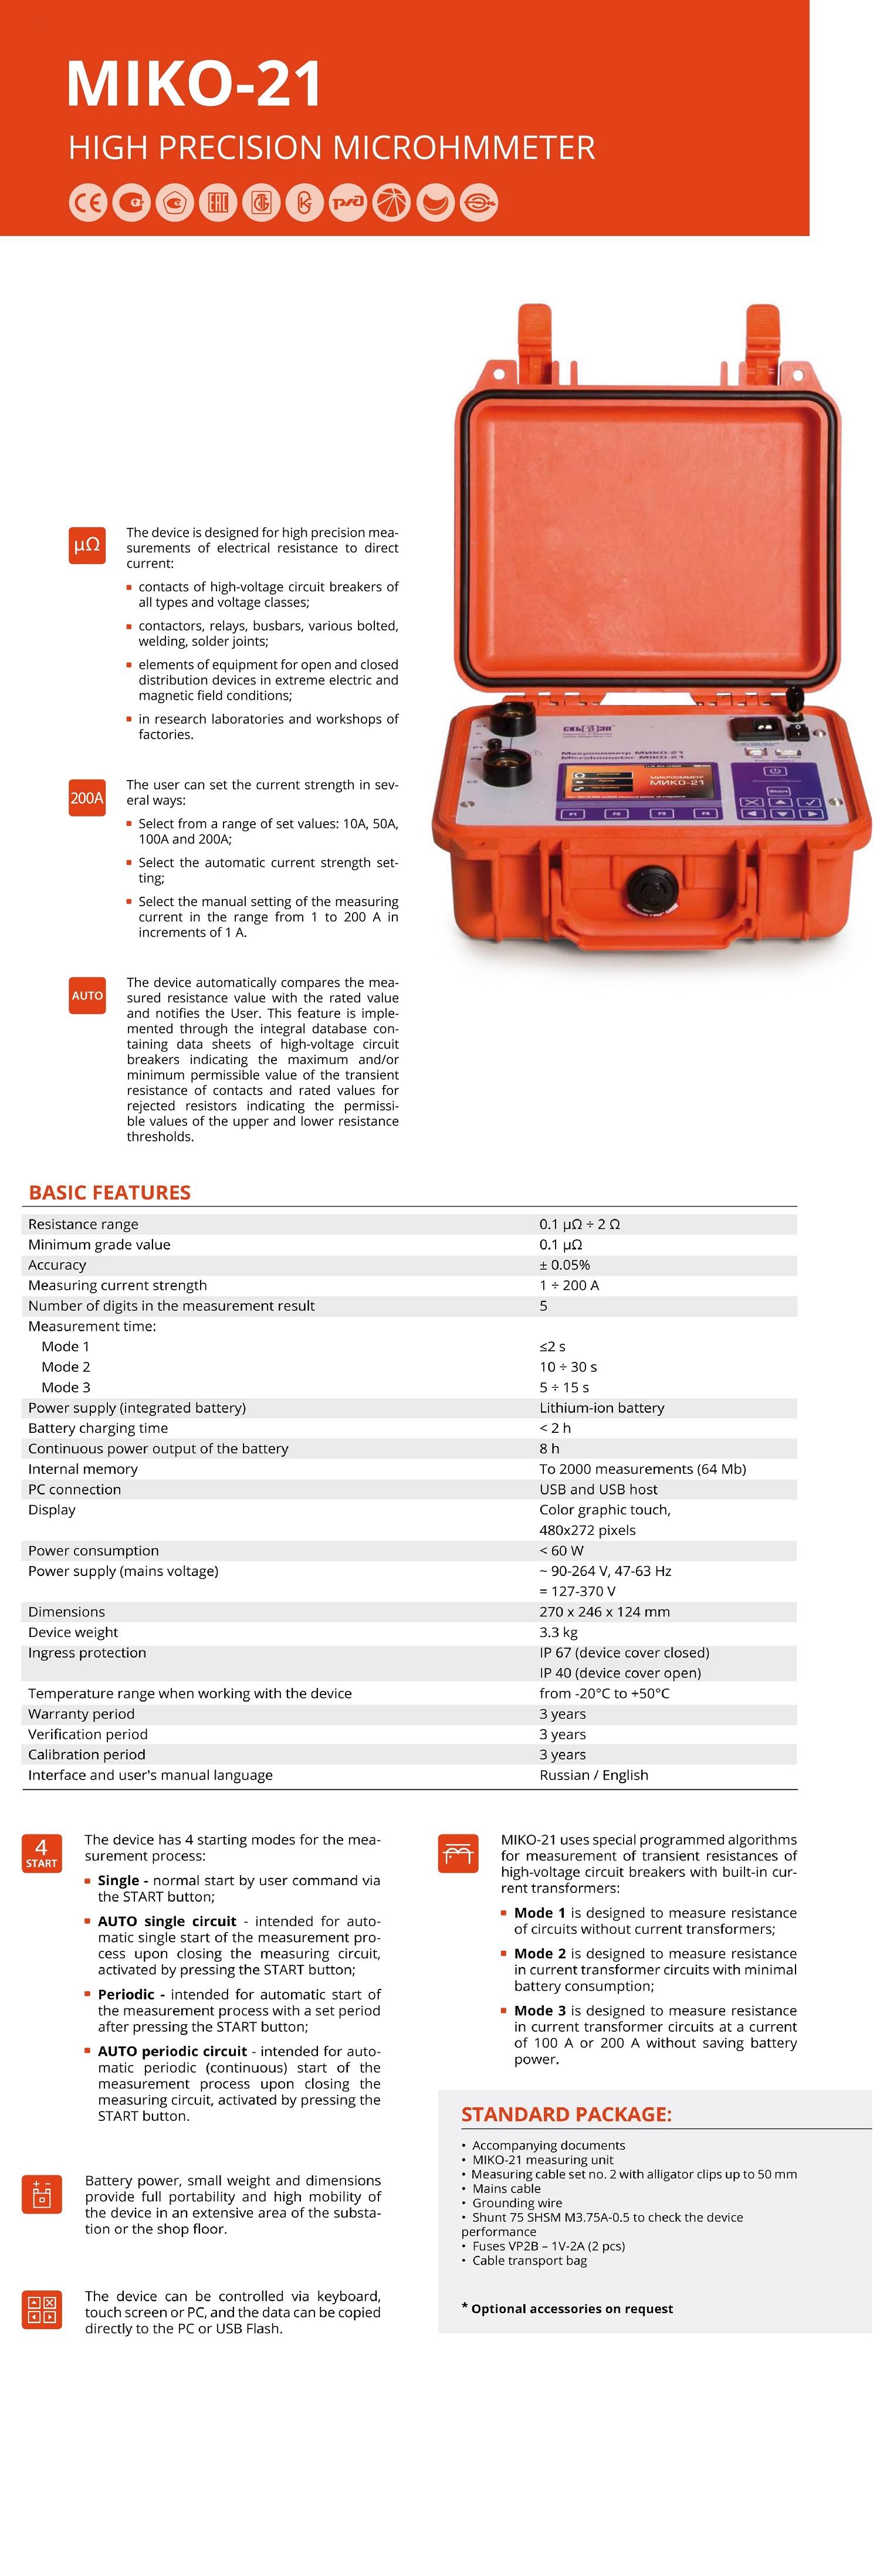 MIKO-21 Digital 200A Micro-Ohmmeter | Test Equipment Australia